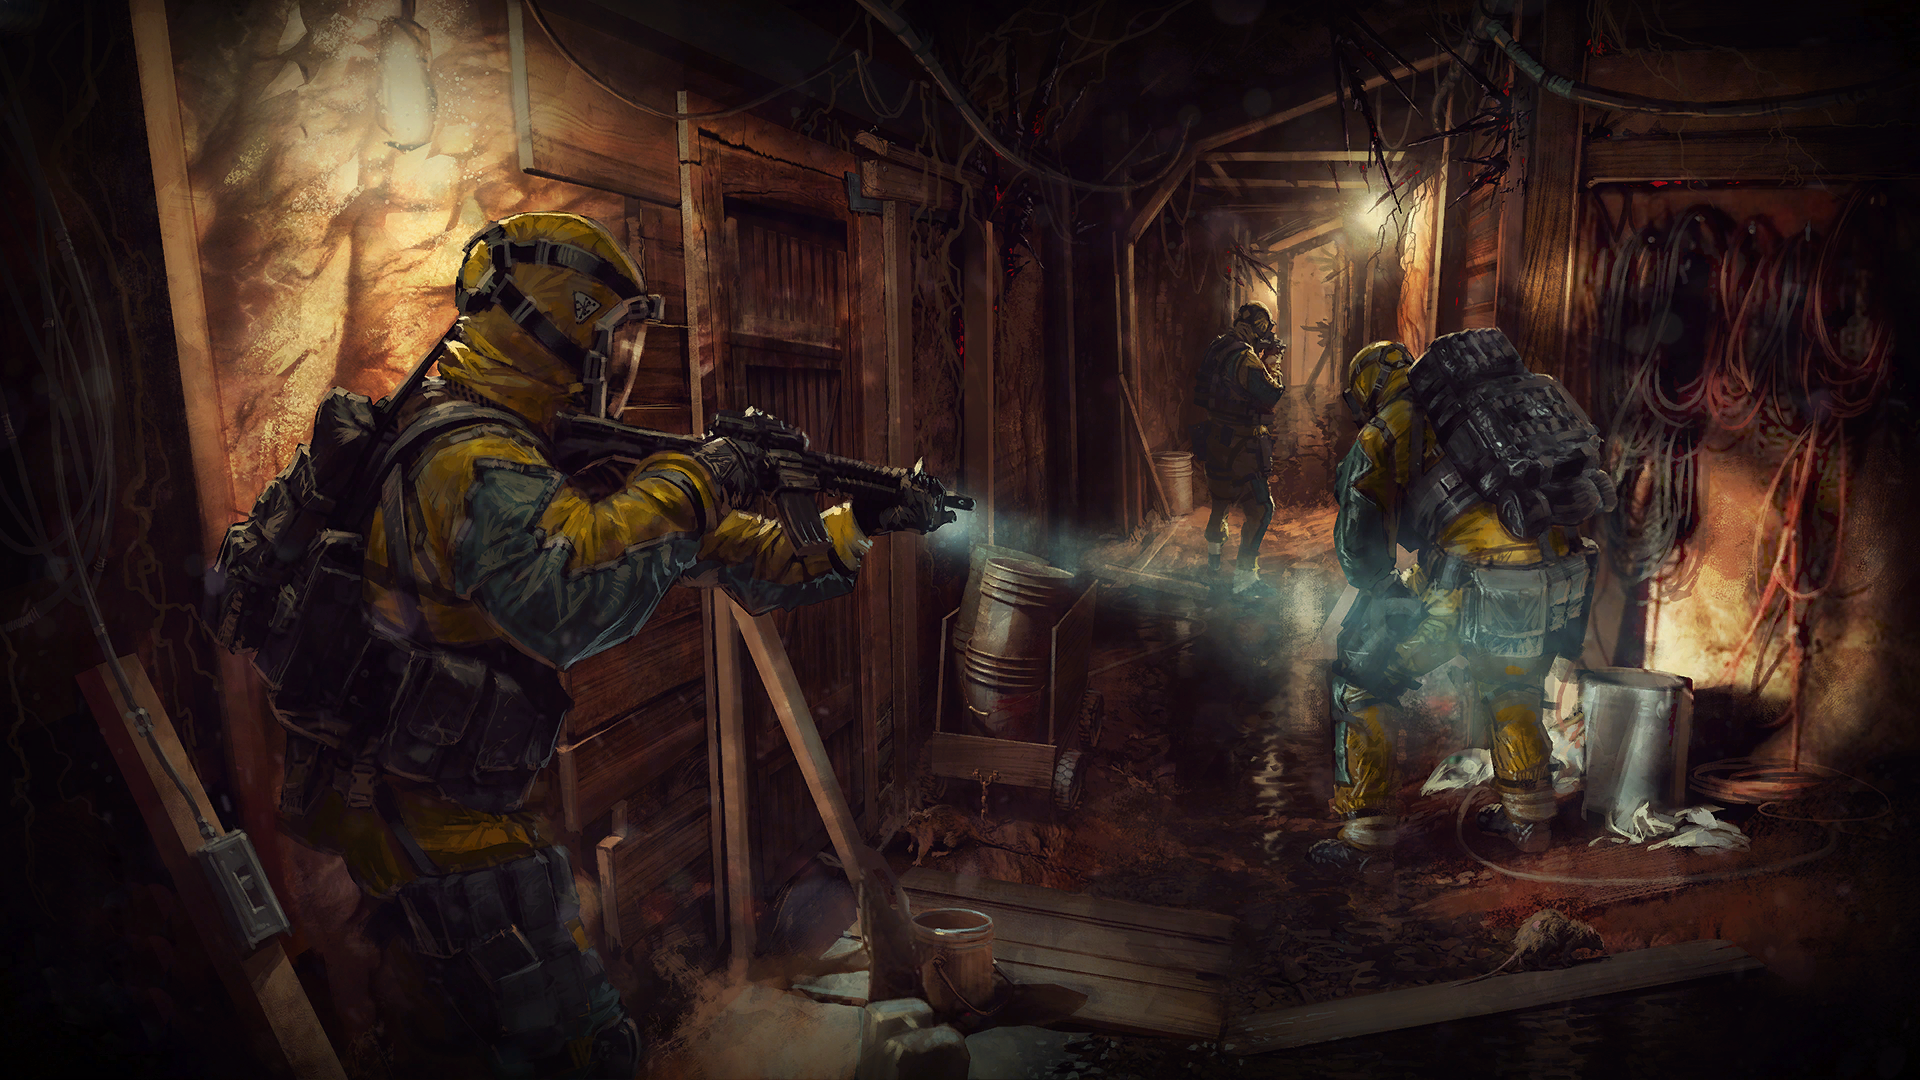 Soldier Video Games Rainbowsix Siege Digital Art Dark: Tom Clancy's Rainbow Six: Siege HD Wallpaper